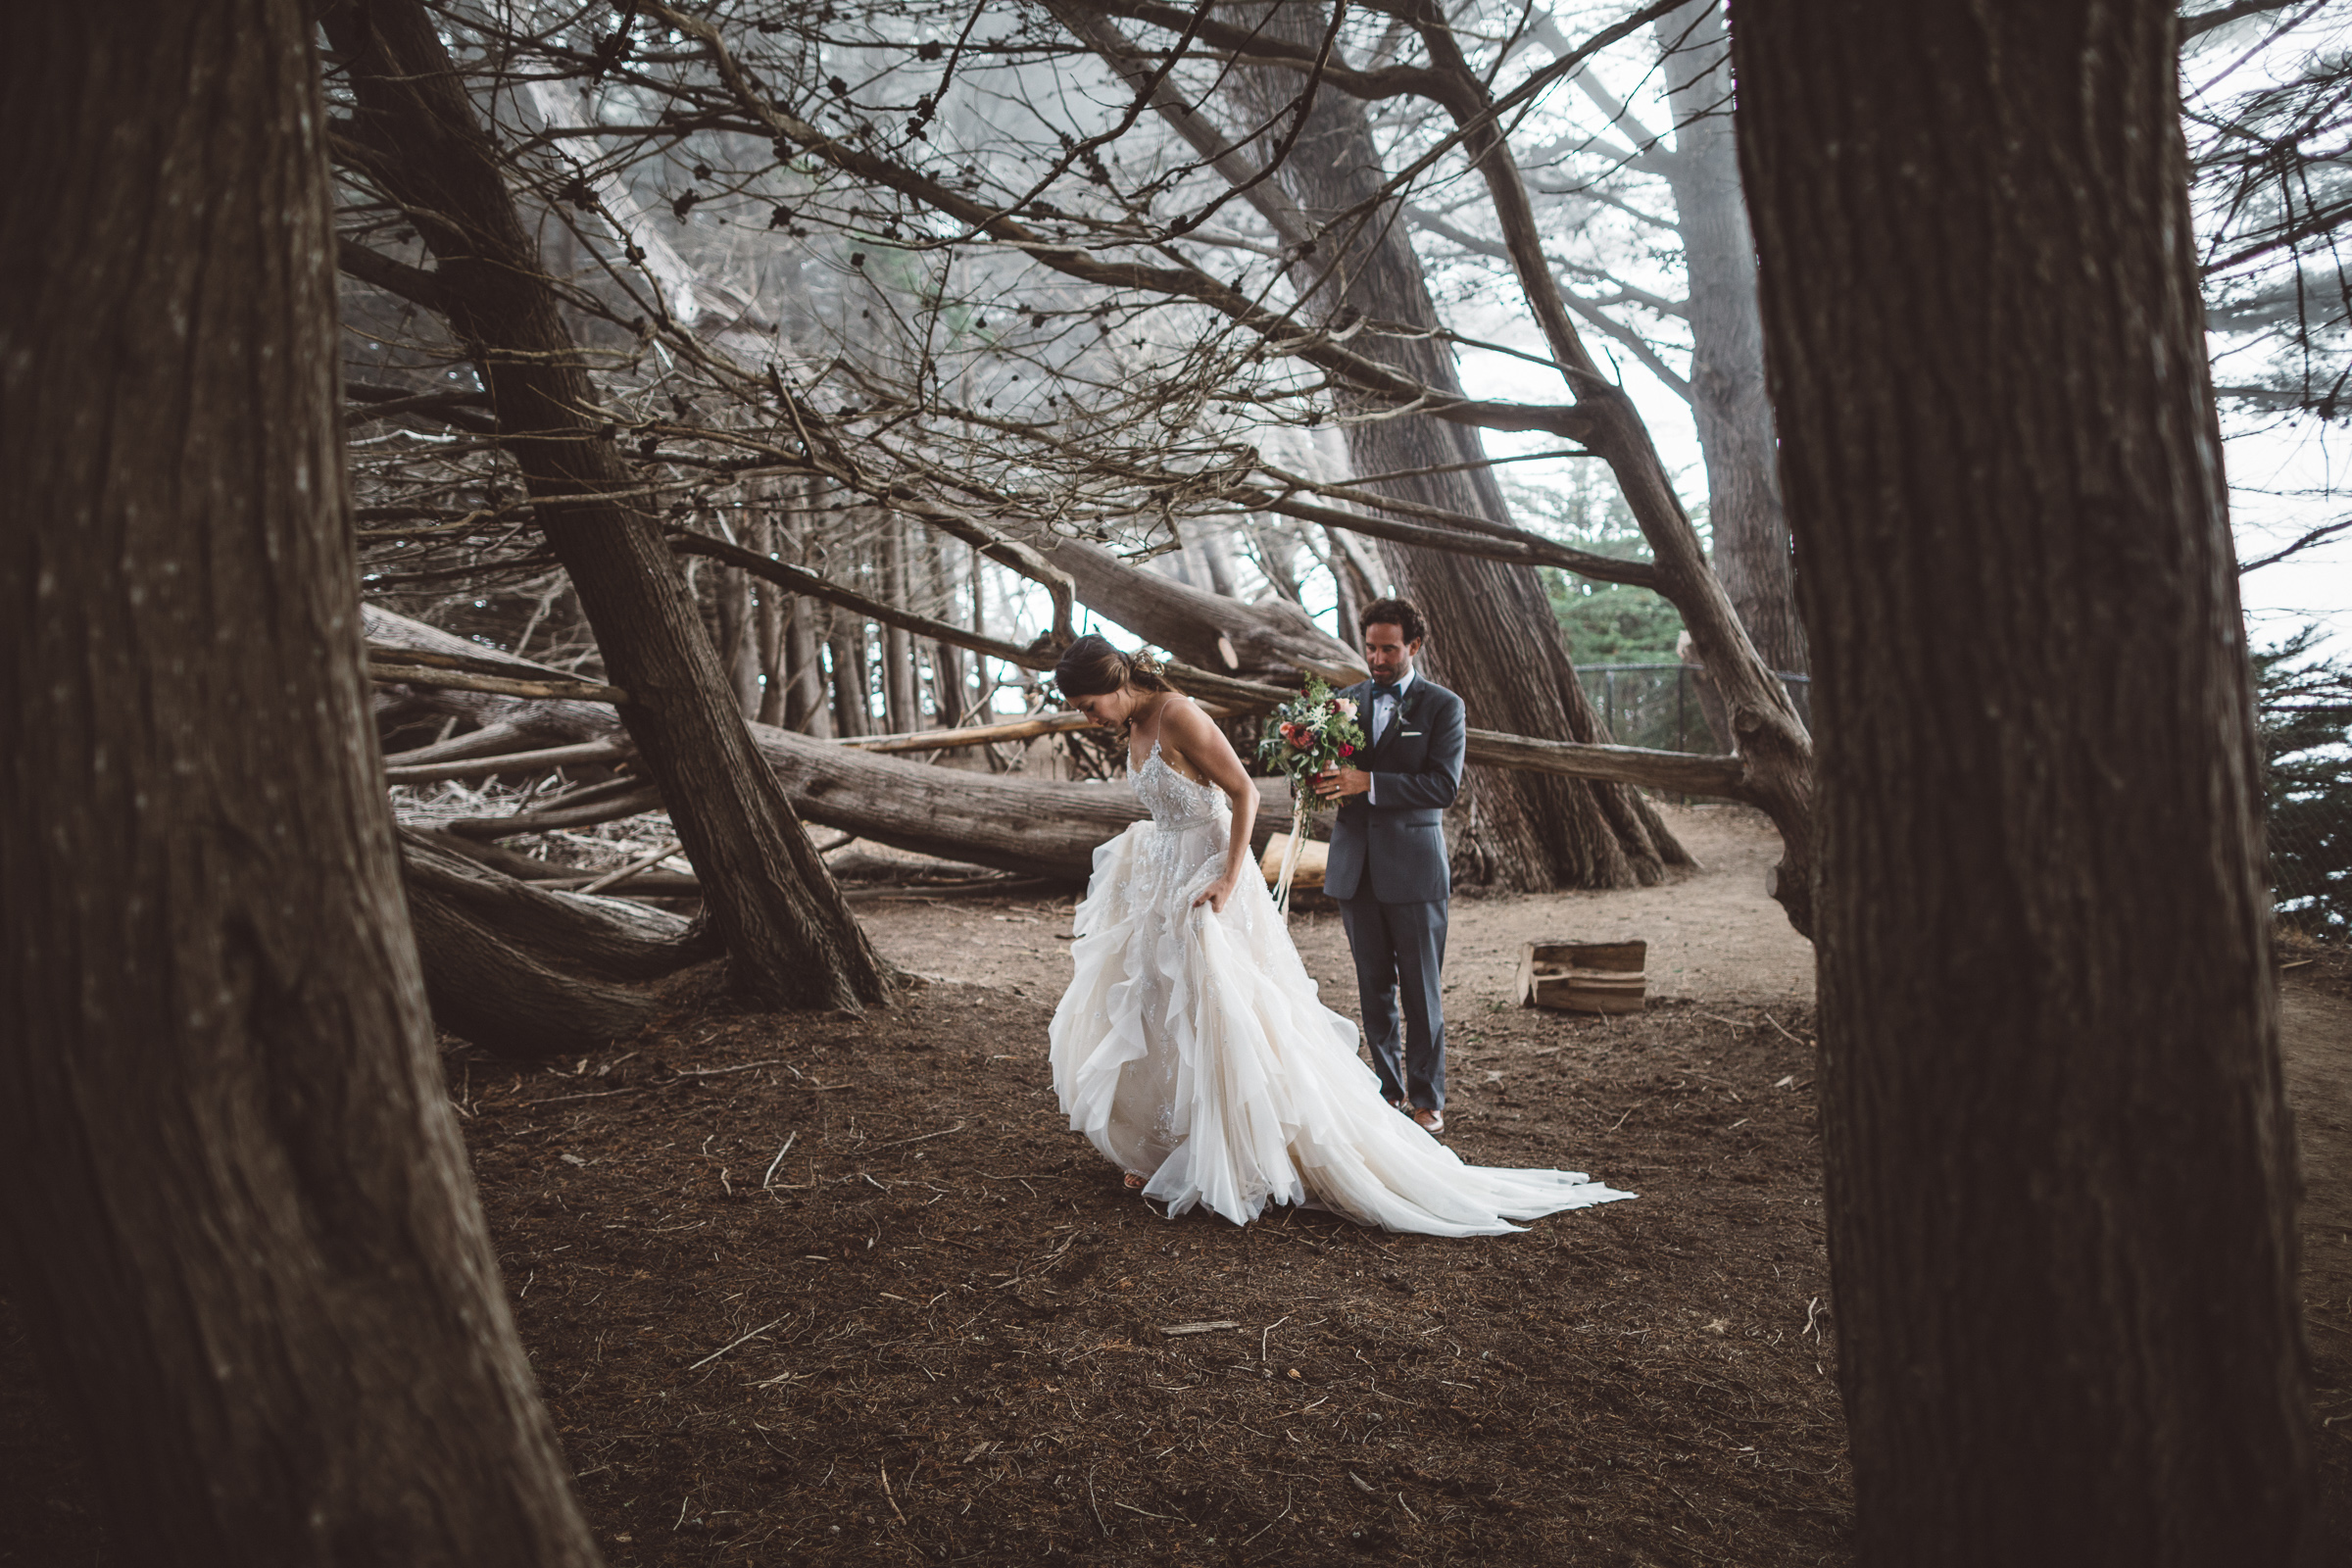 Becca + Mike Wedding    Ragged Point - Big Sur, CA